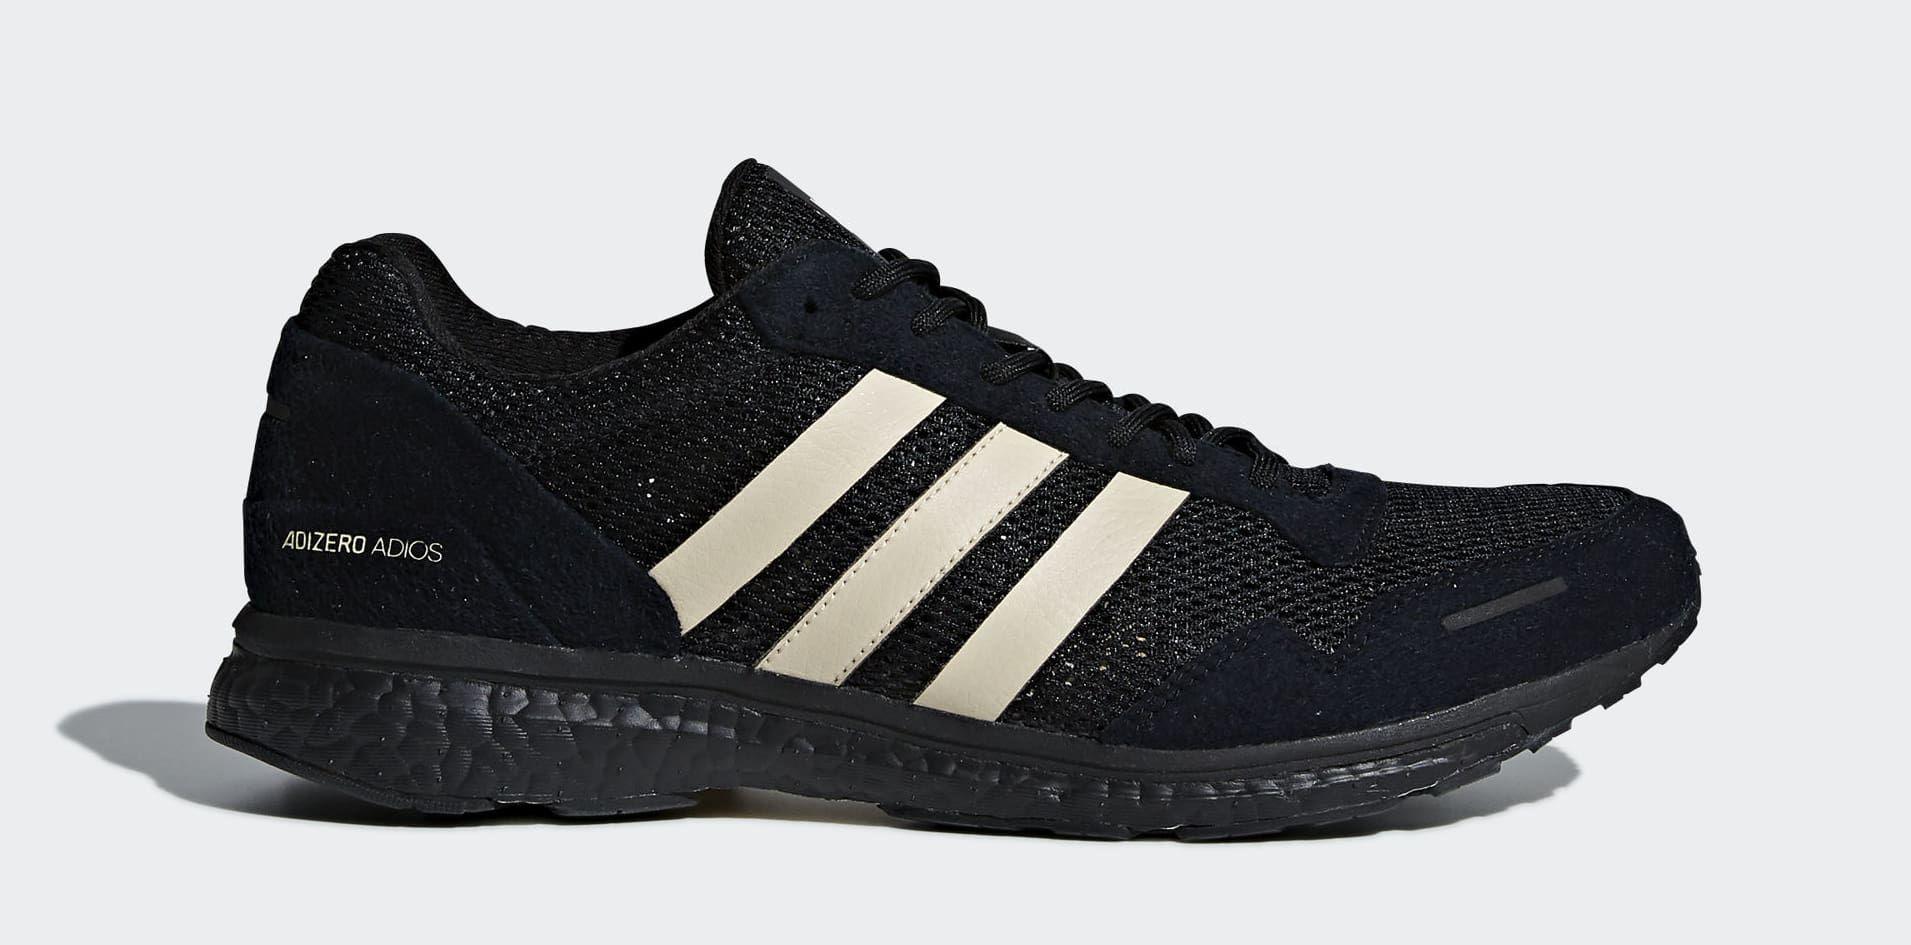 online retailer 55ad2 fd8f1 Undefeated x Adidas Adizero Adios 3 B22483 (Lateral)